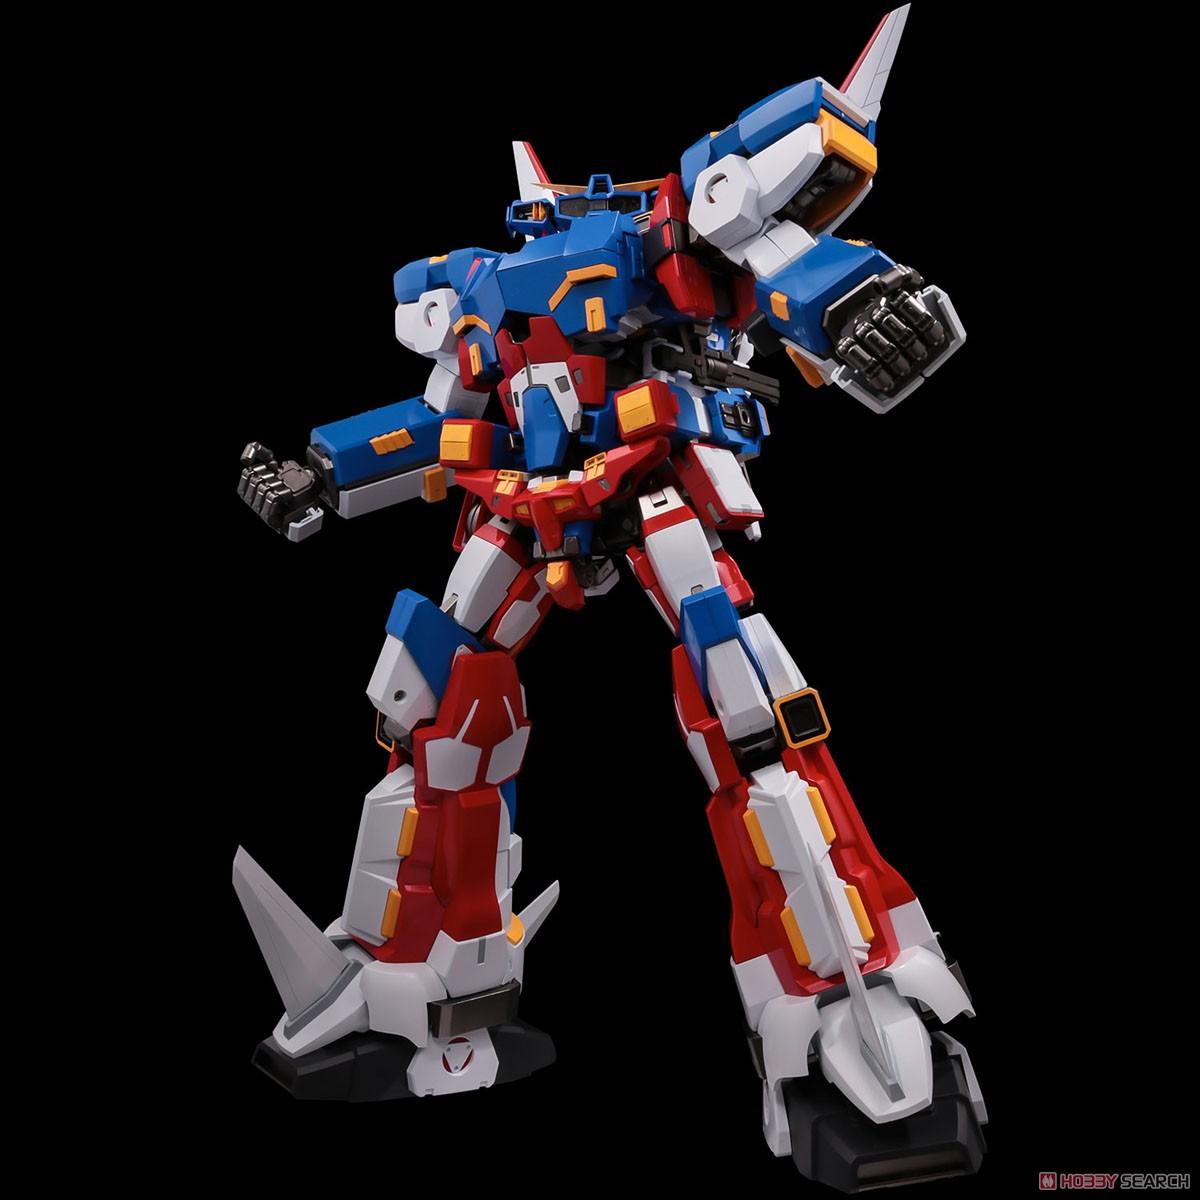 RIOBOT『変形合体 R-1』スーパーロボット大戦OG 可変合体フィギュア-044